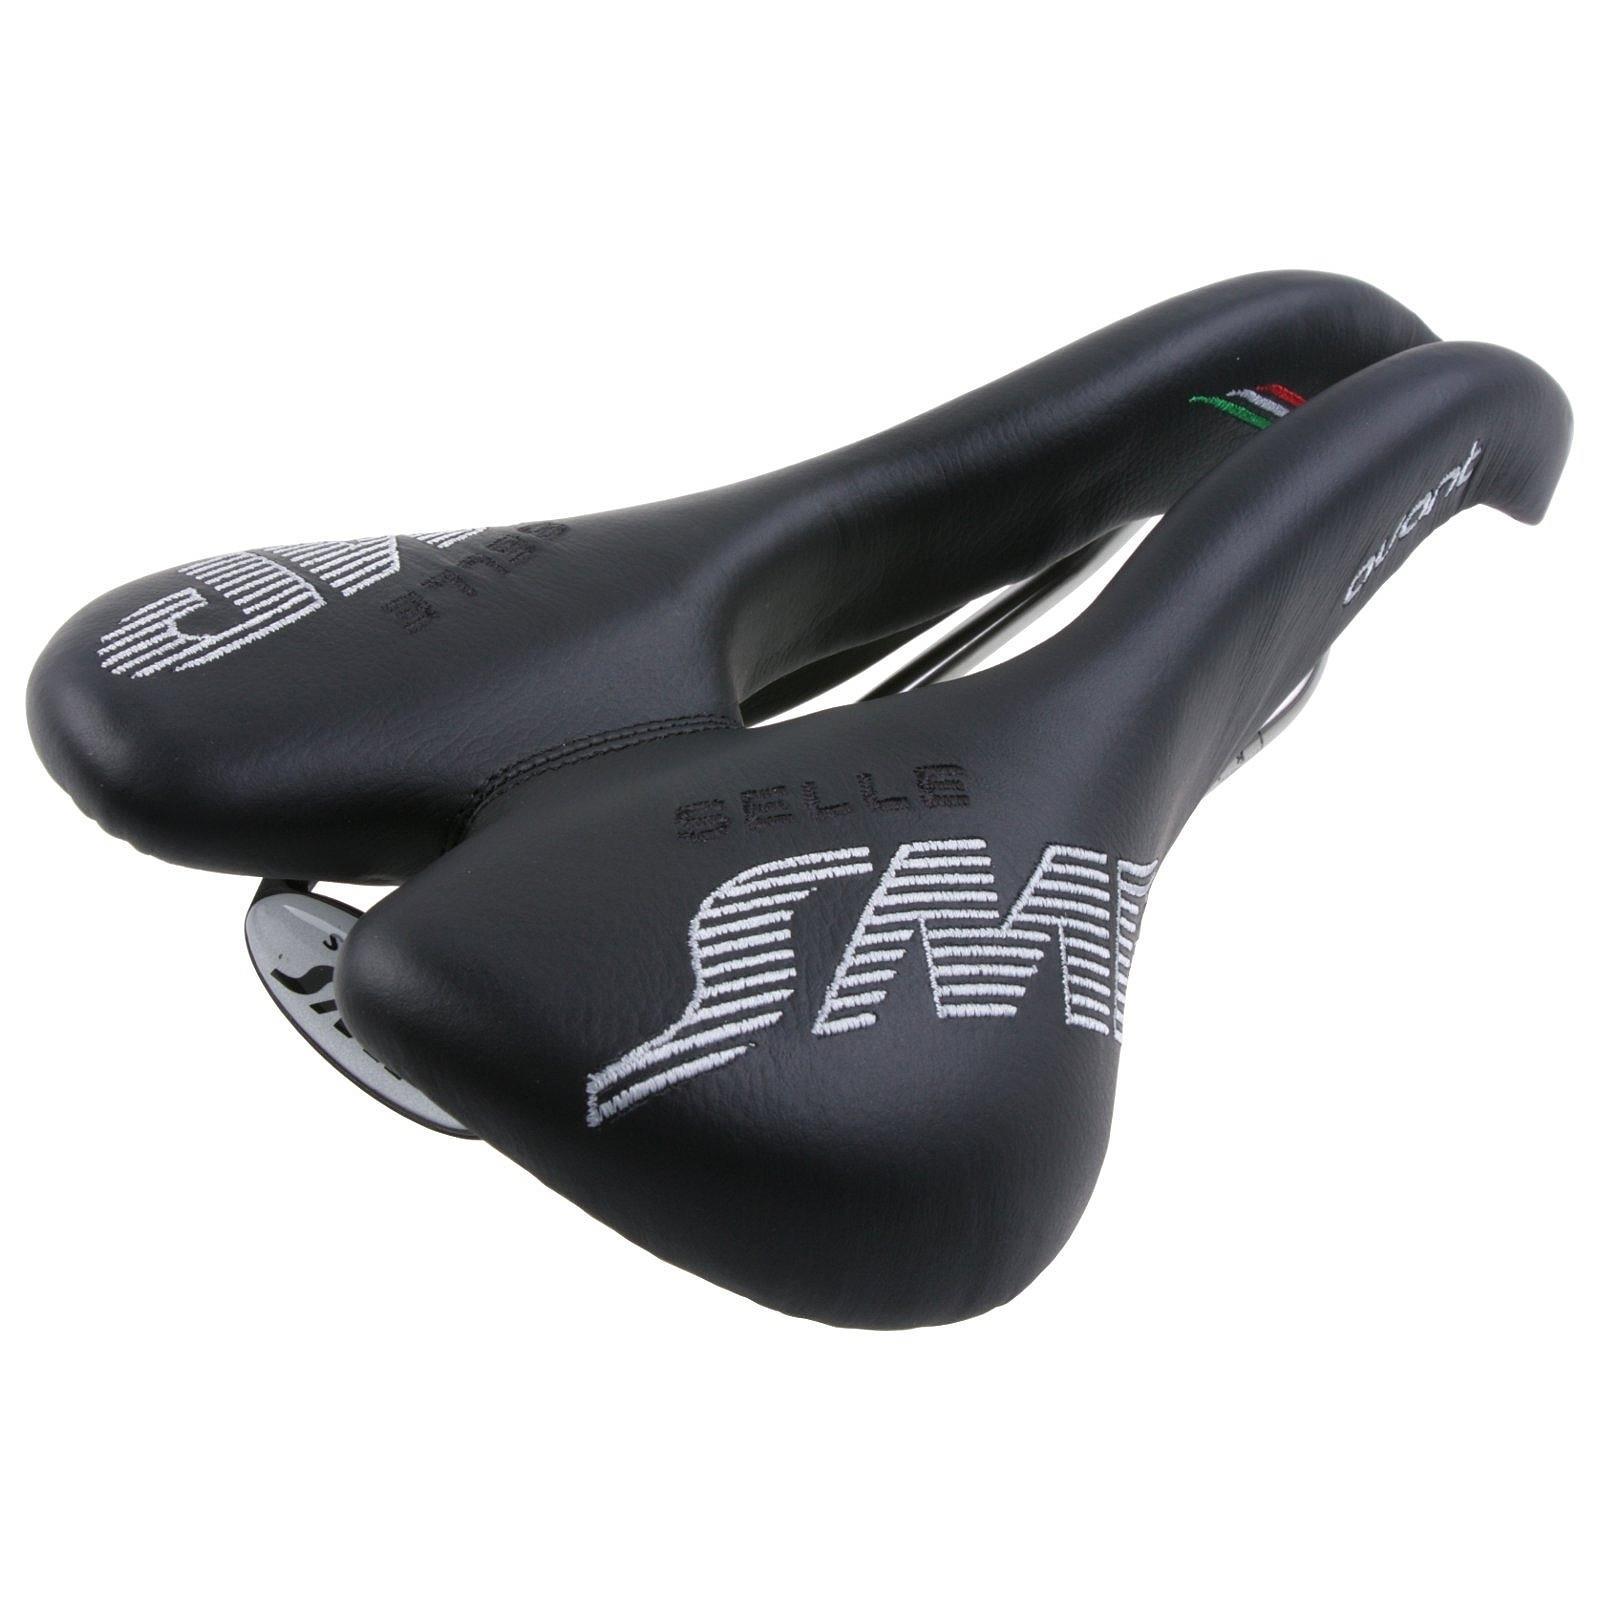 Selle SMP Avant 4bike Rennrad MTB Fahrradsattel 269 x 154